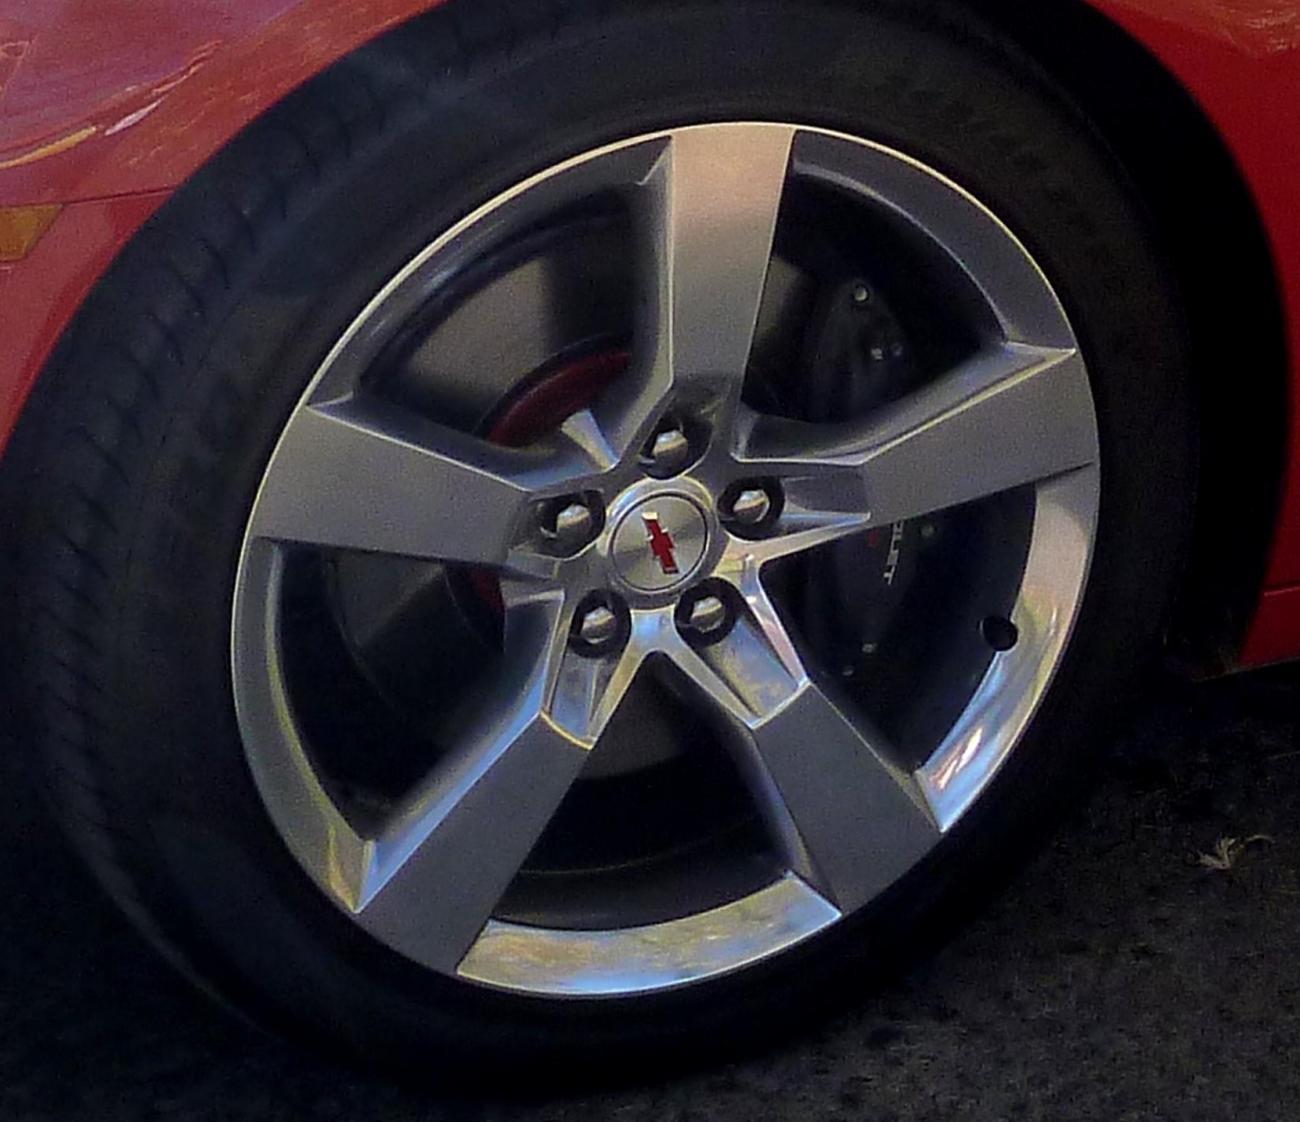 2011 2012 wheels for sale camaro5 chevy camaro forum. Black Bedroom Furniture Sets. Home Design Ideas